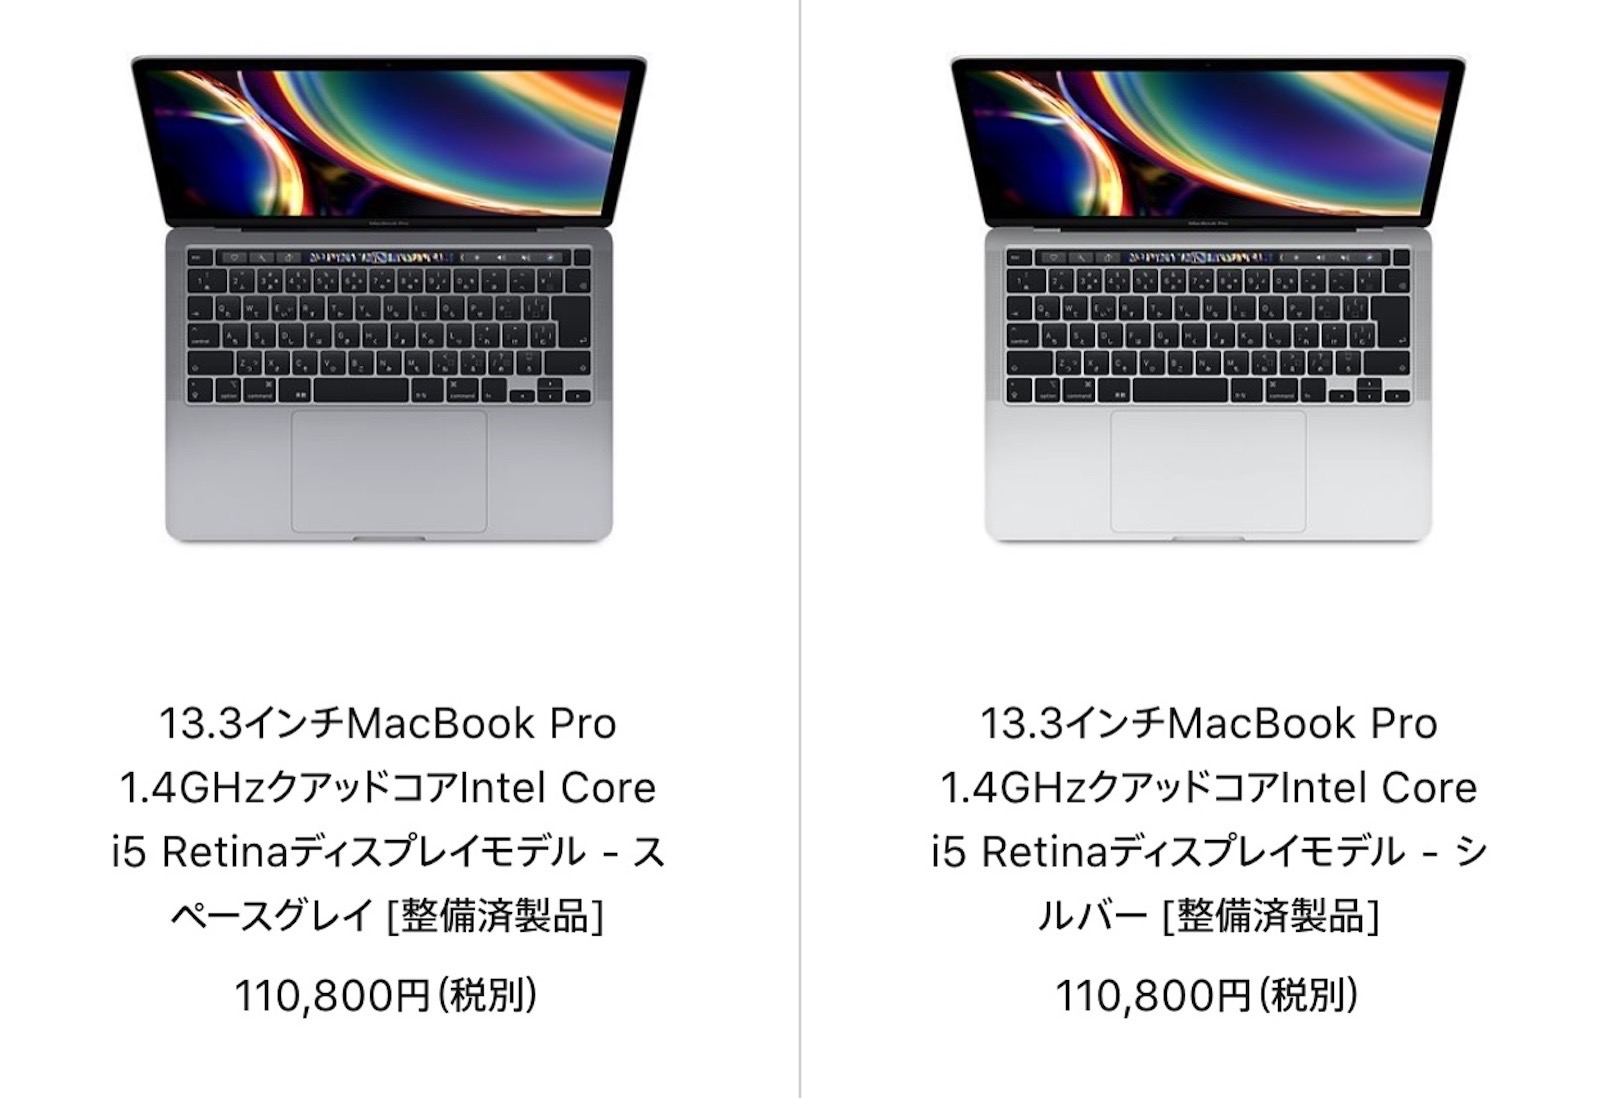 macbook-pro-refurbished-20210223.jpg